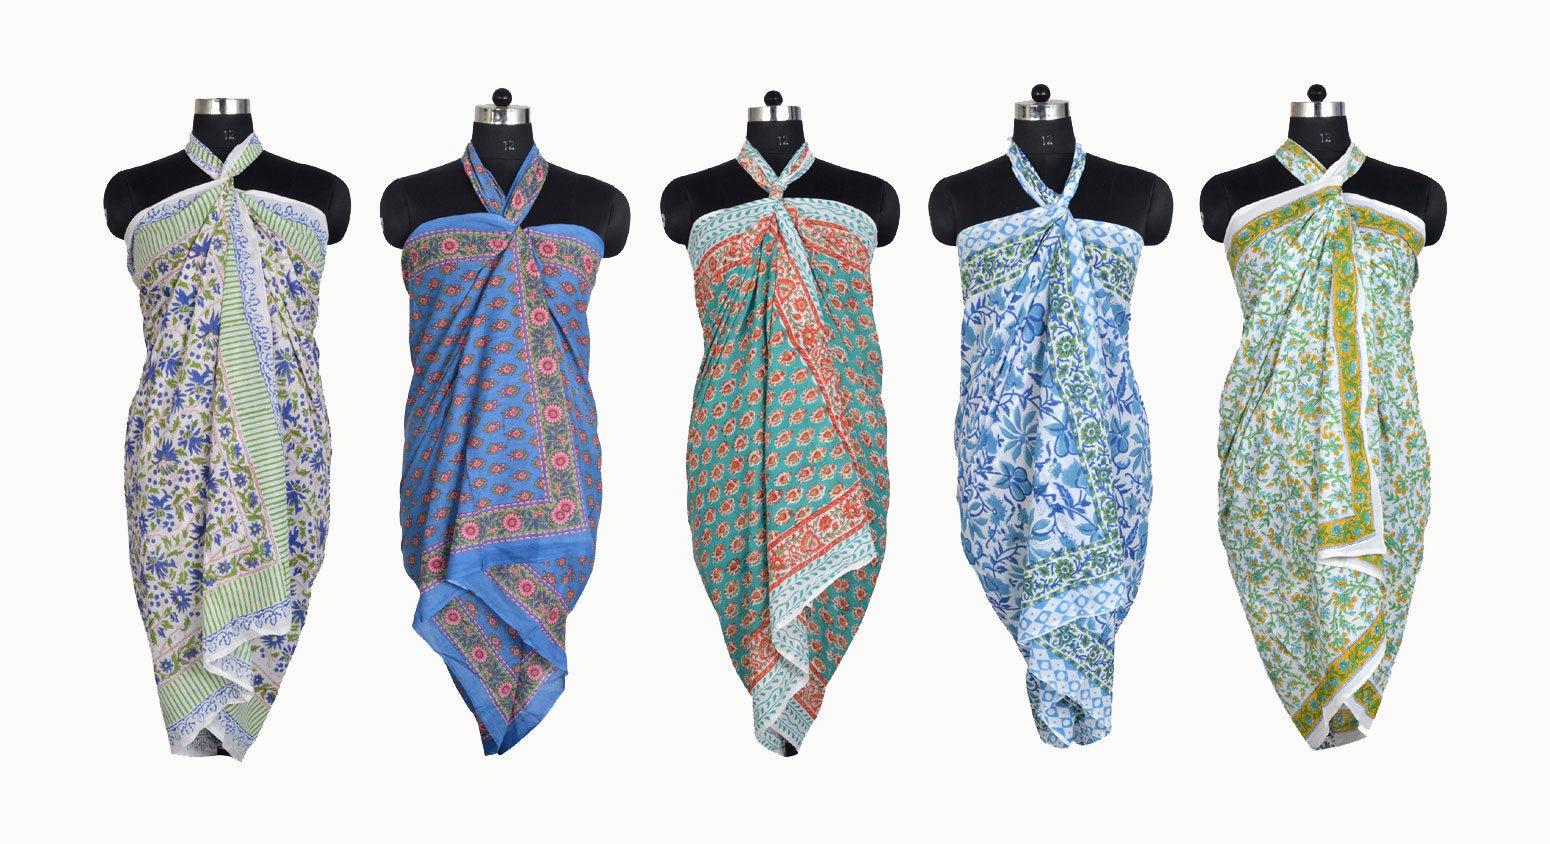 c9f3ef5973dda S l1600. S l1600. Previous. Block Print Cotton Beach Wrap Long Sexy Sarong  Cover-Up Swimwear Pareo ...